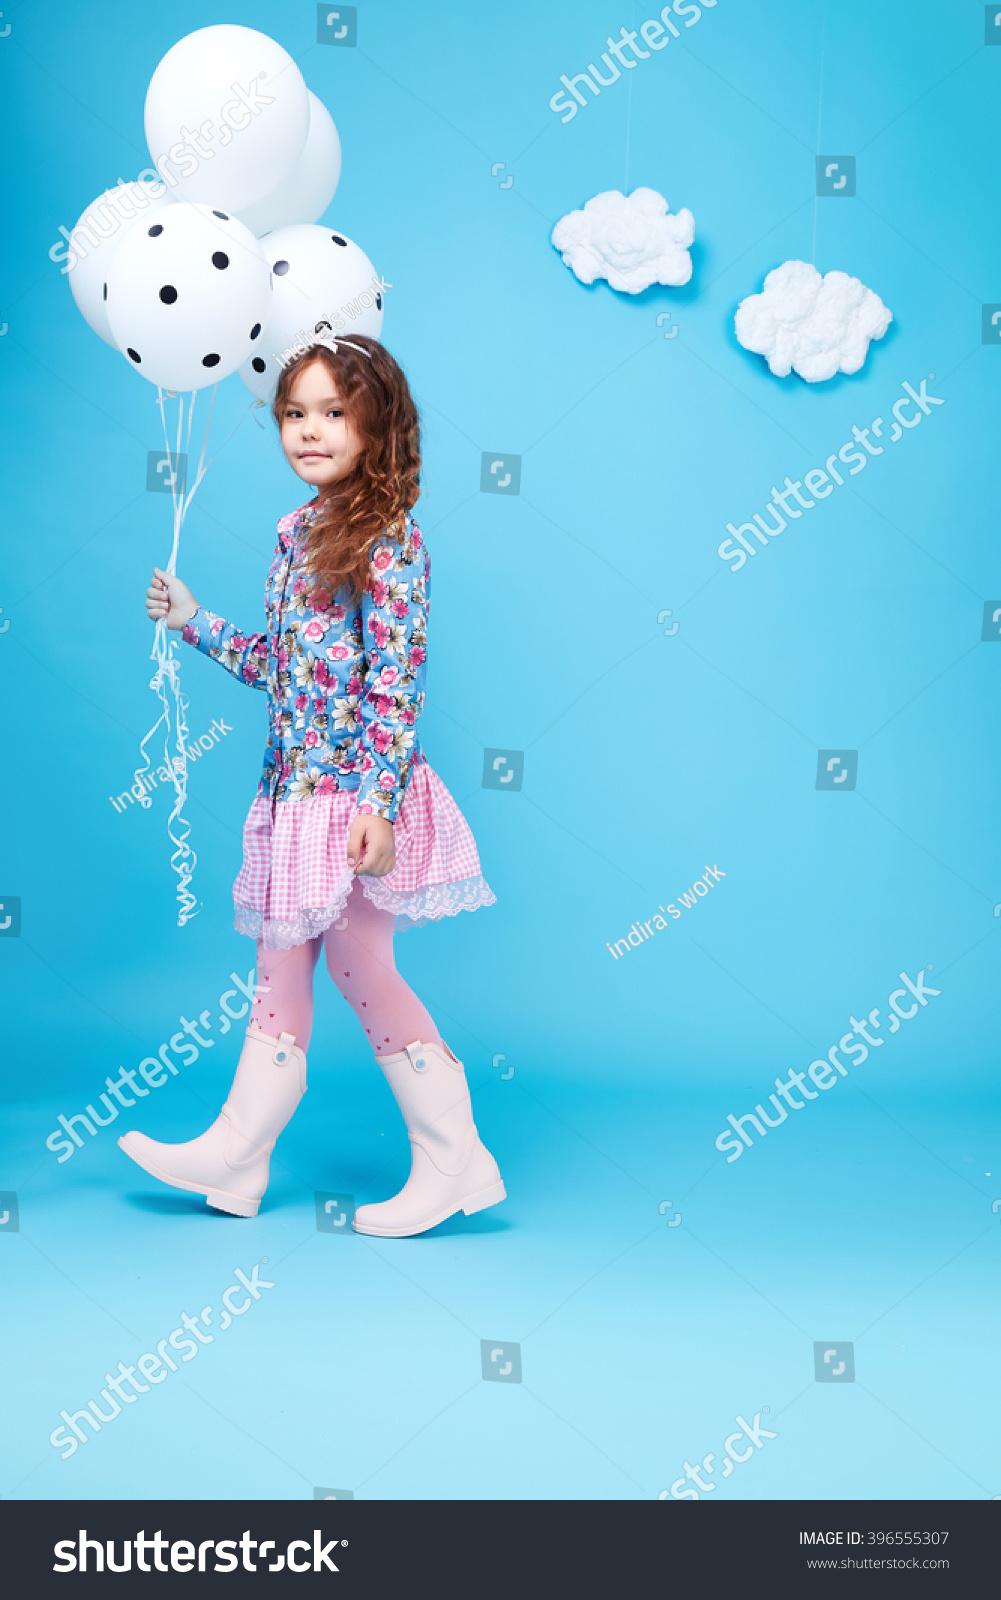 72e93f496 Beautiful little cute girl smile long dark hair take balloons wear style  fashion silk cotton dress spring mood children clothing childhood daughter  pretty ...